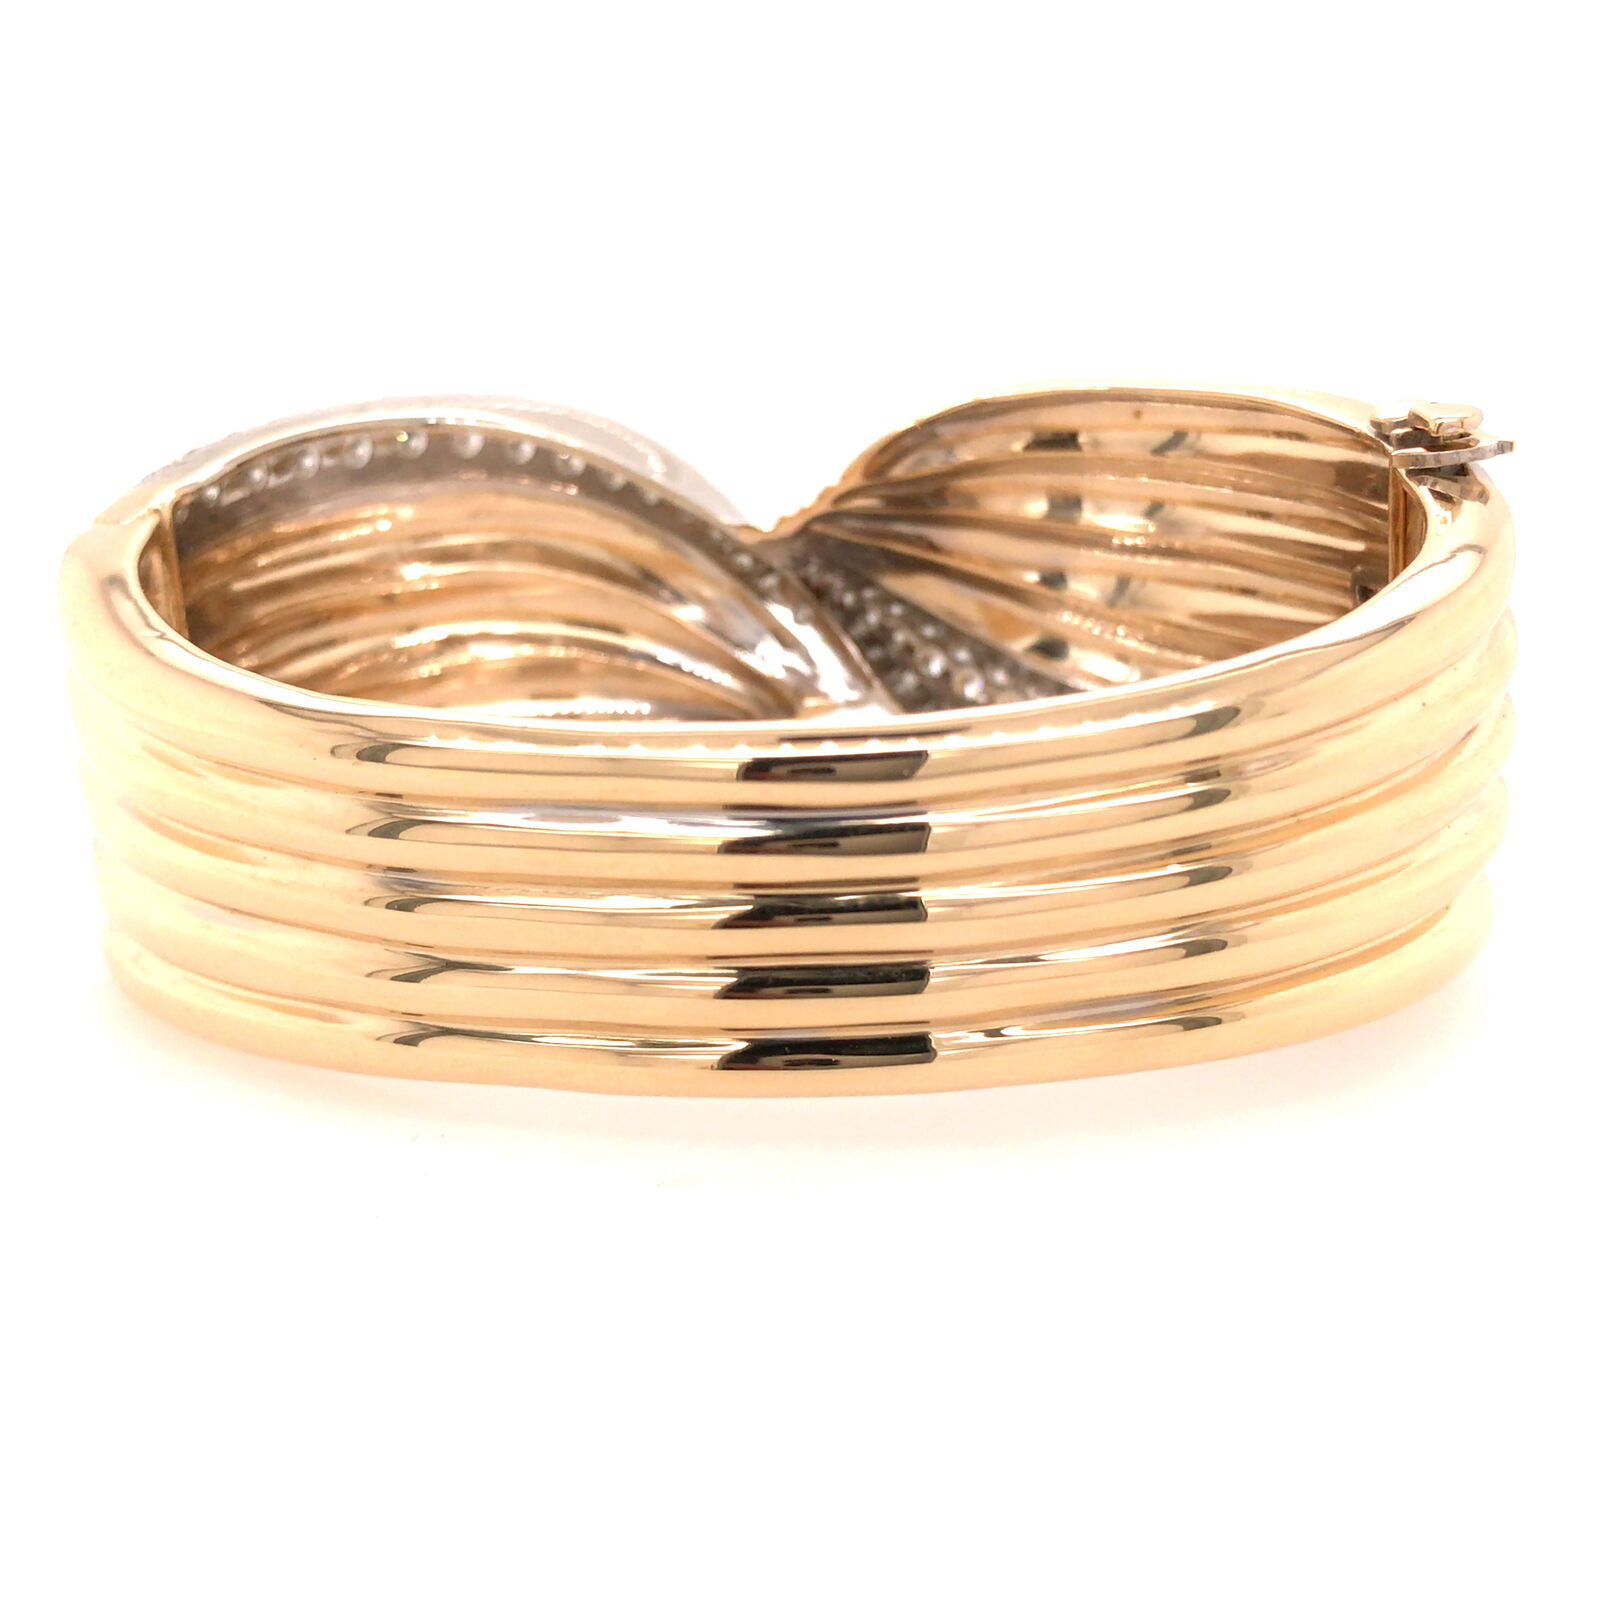 14K Wide Diamond Twist Cuff Two-Tone Gold - image 4